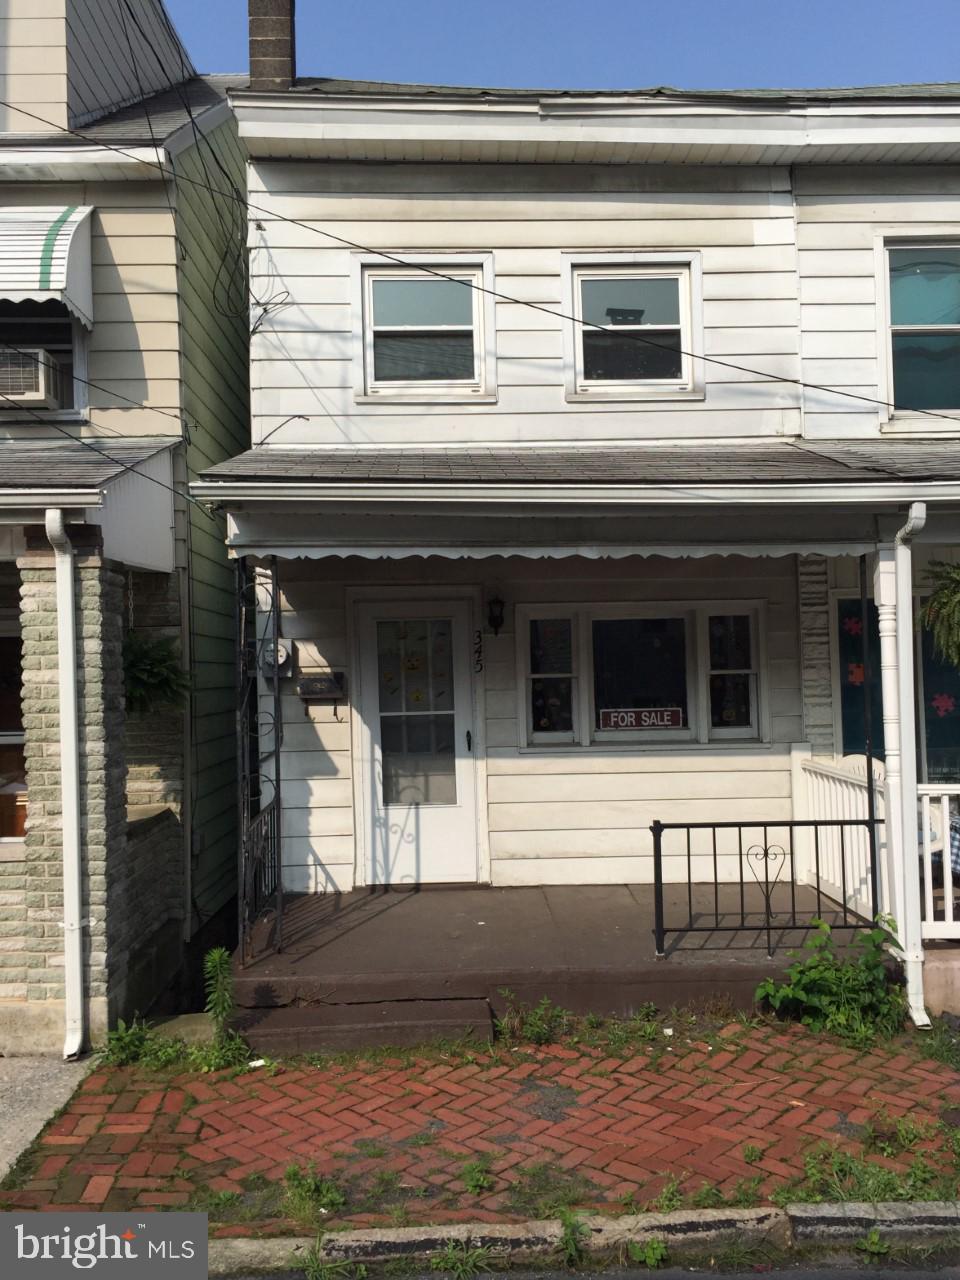 345 NEW CASTLE STREET, MINERSVILLE, PA 17954